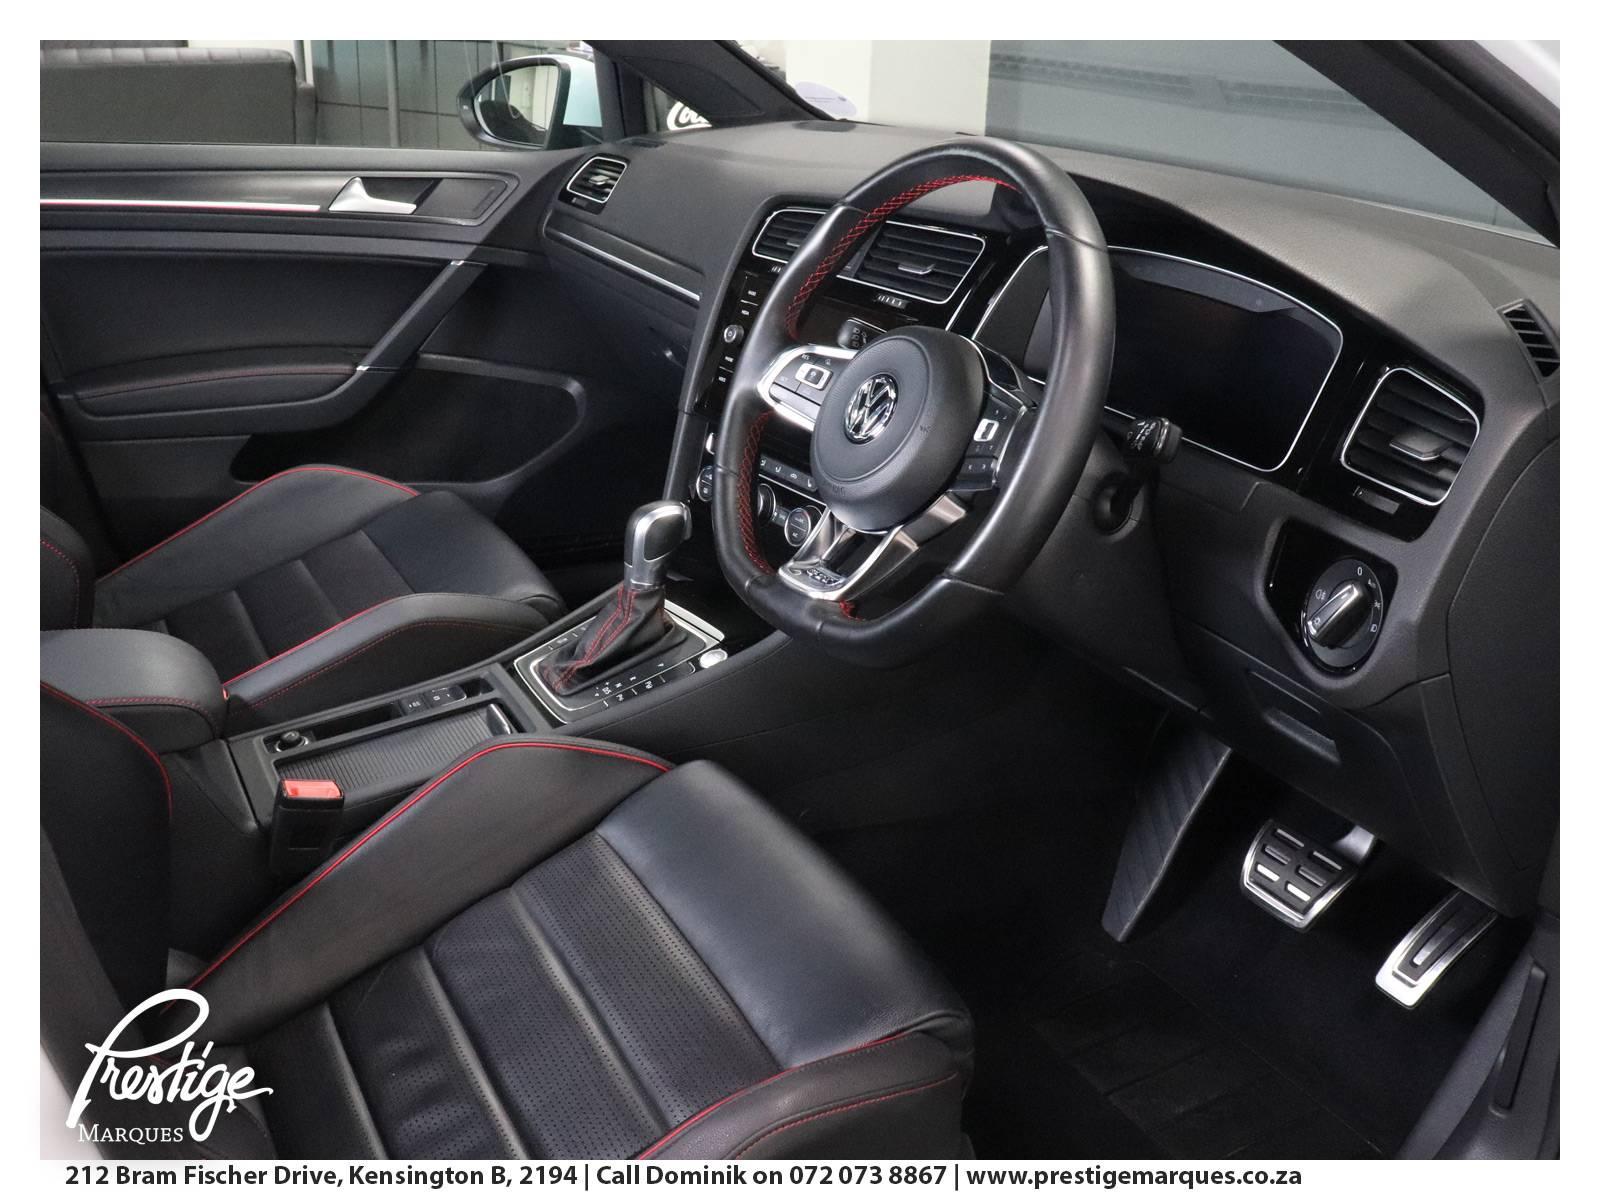 2017-Volkswagen-Golf-GTI-DSG-Facelift-Prestige-Marques-Randburg-Sandton-10